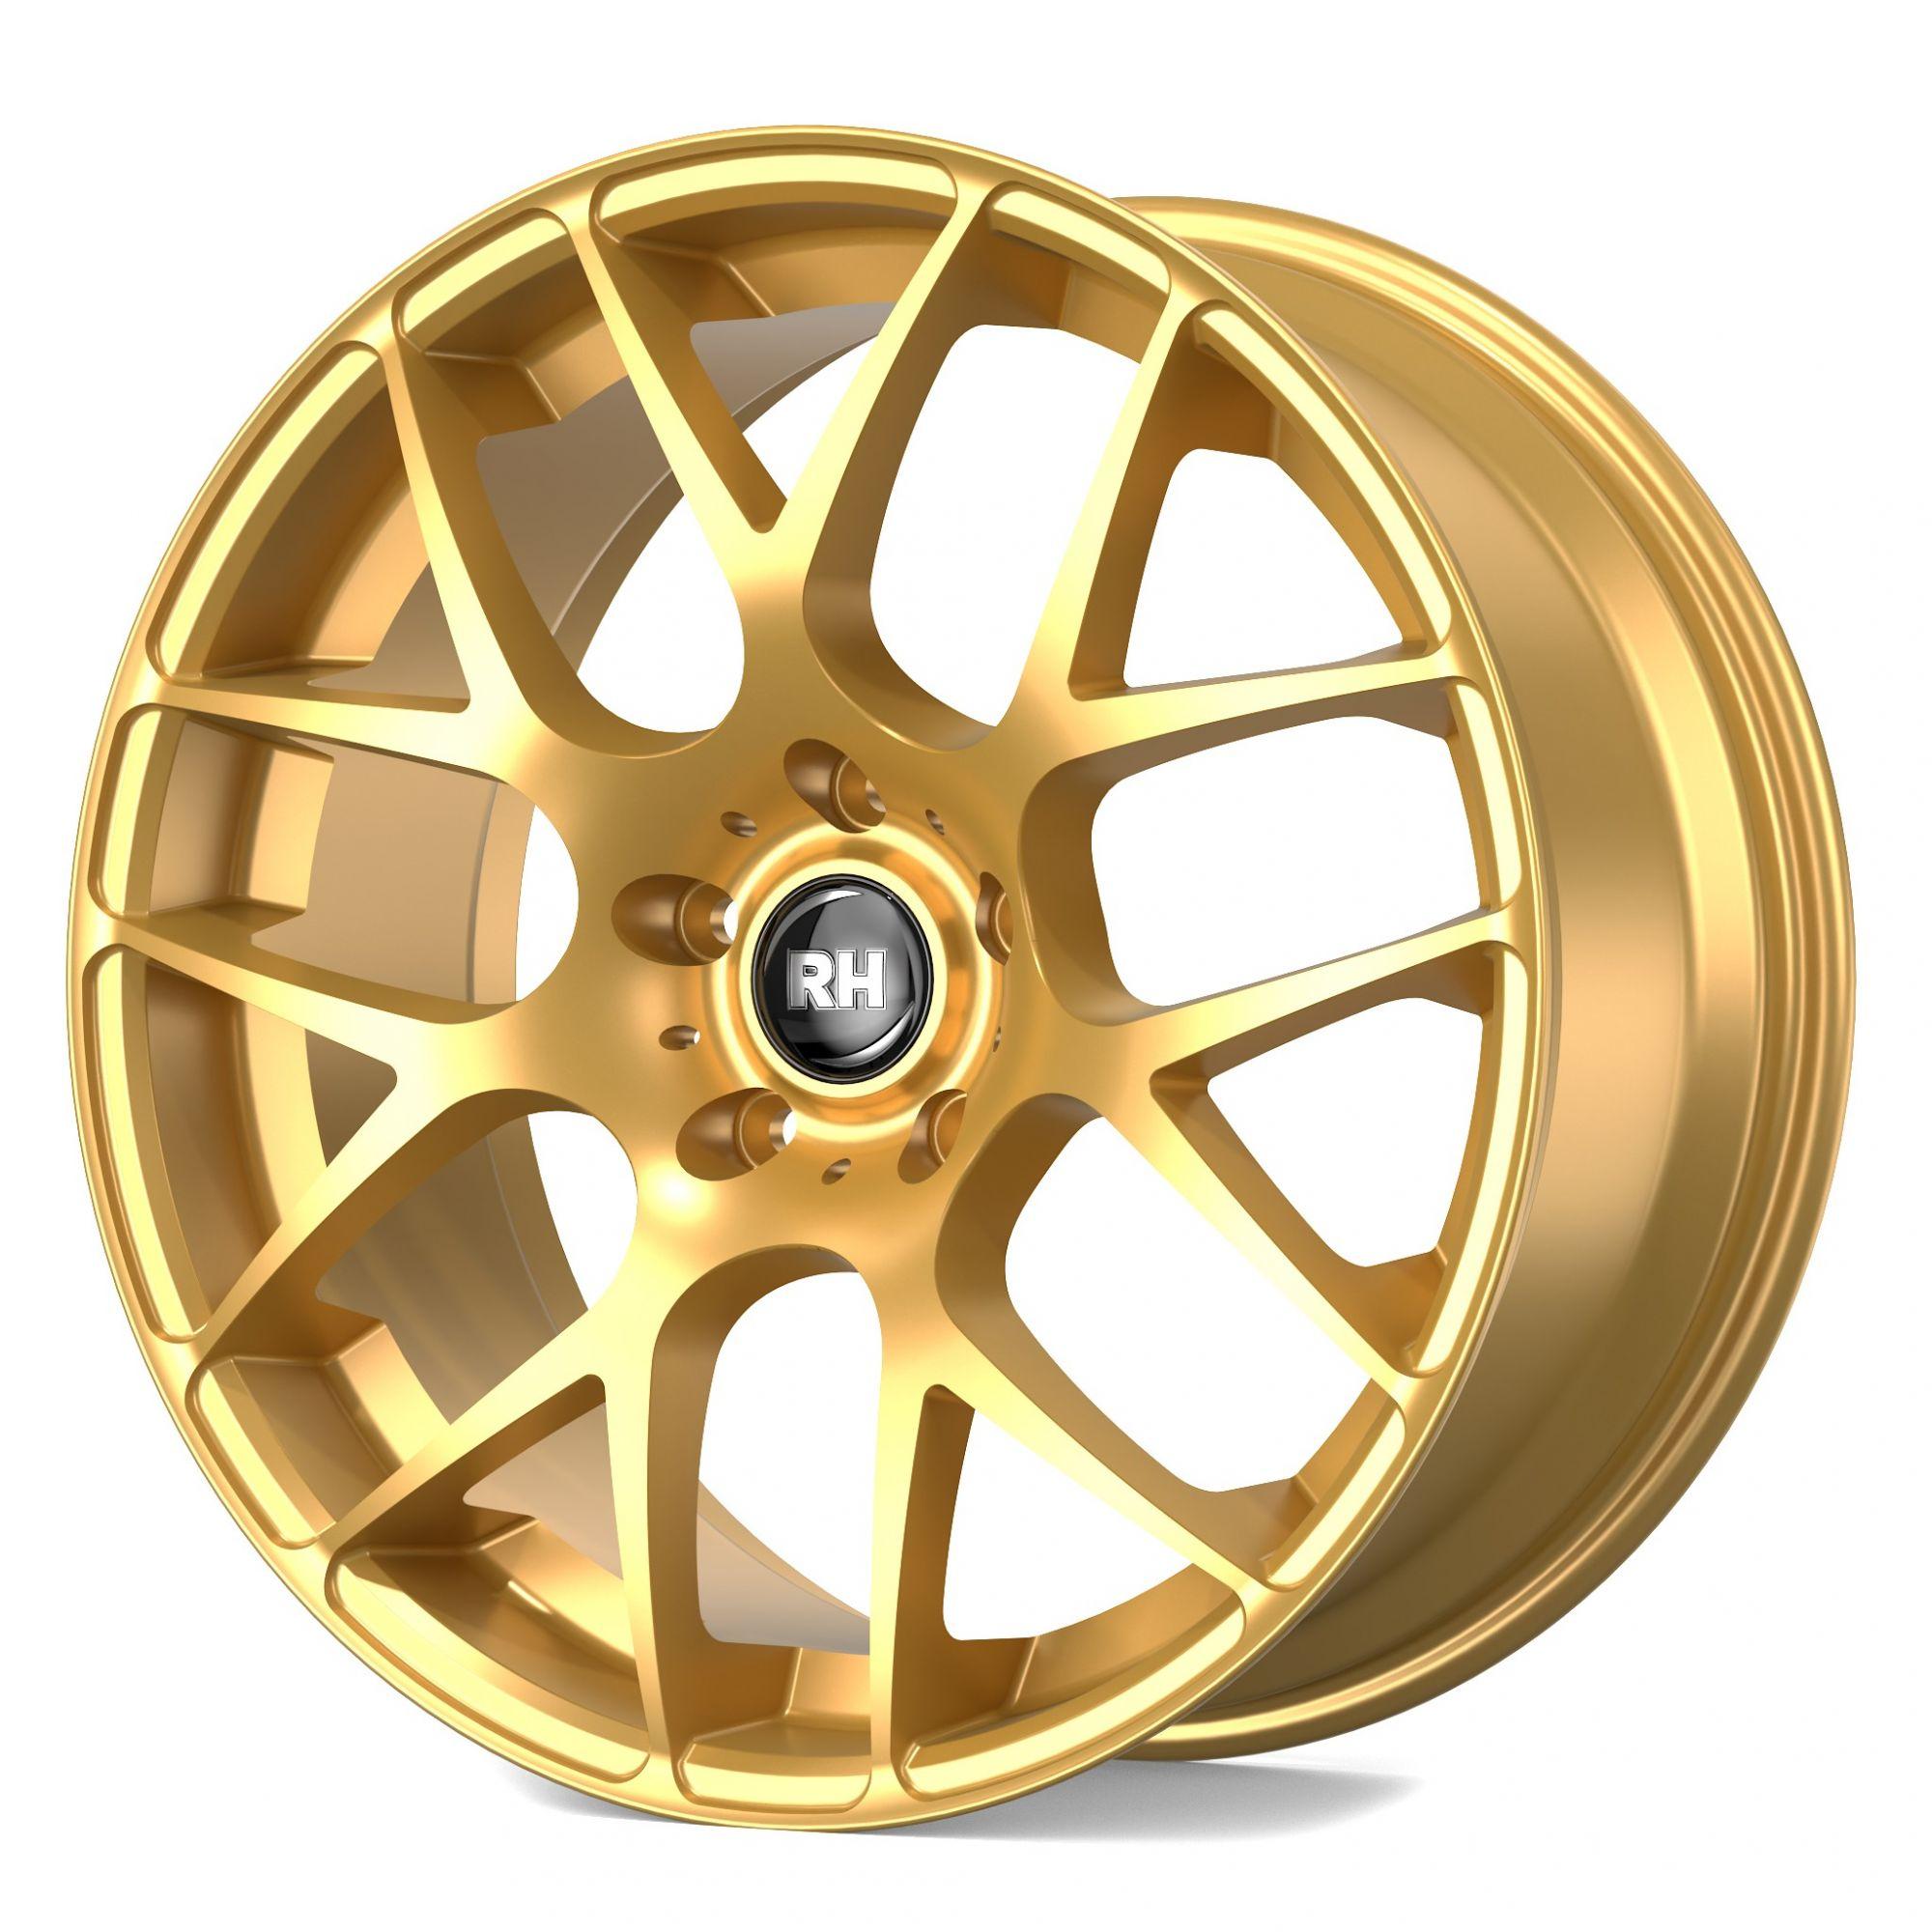 rh alurad nbu race felgen racing gold glanz in 19 zoll. Black Bedroom Furniture Sets. Home Design Ideas